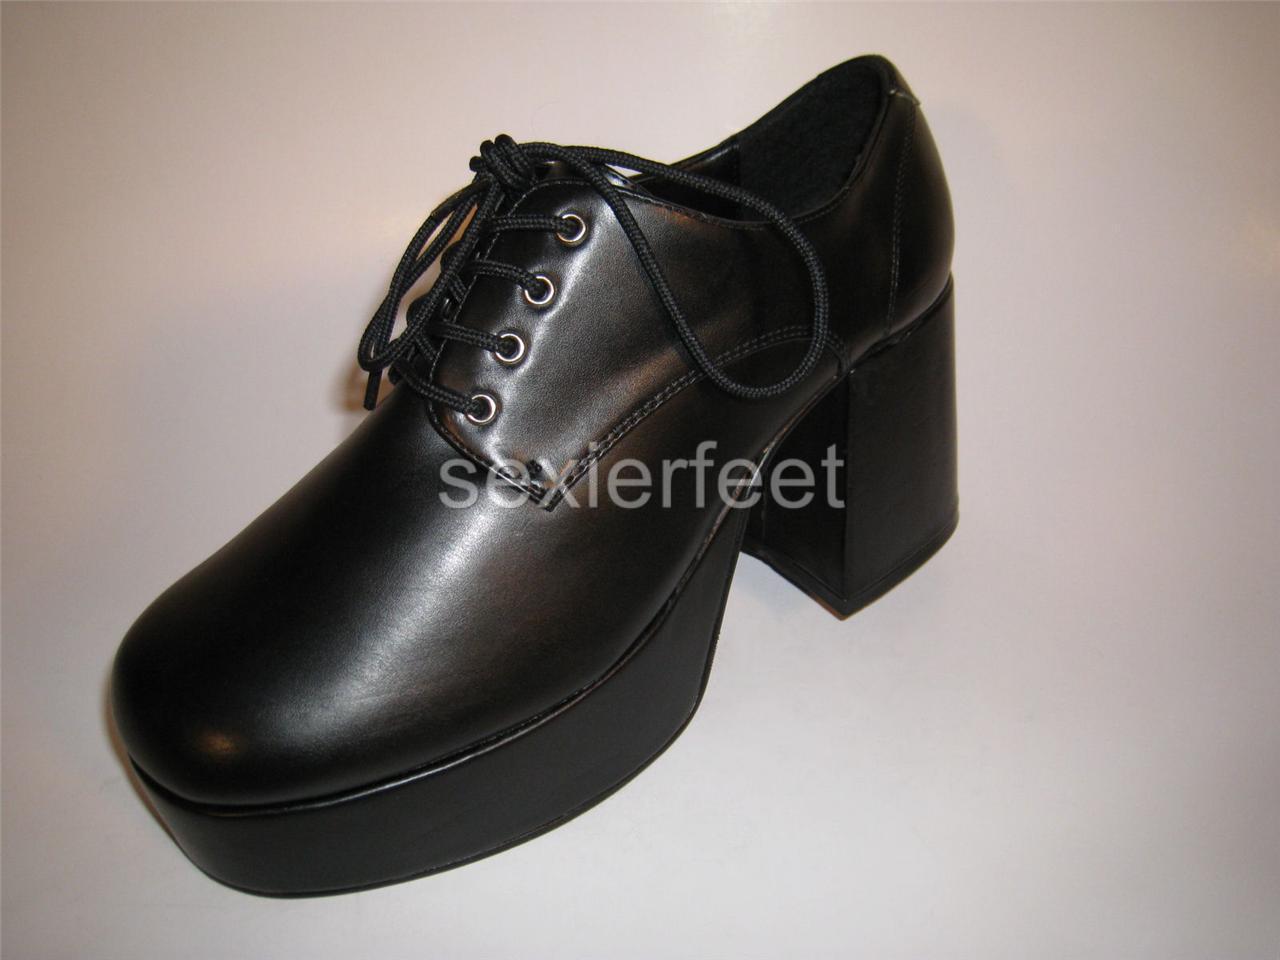 funtasma 3 1 2 quot heel s disco shoes jazz 2 jazz 02g